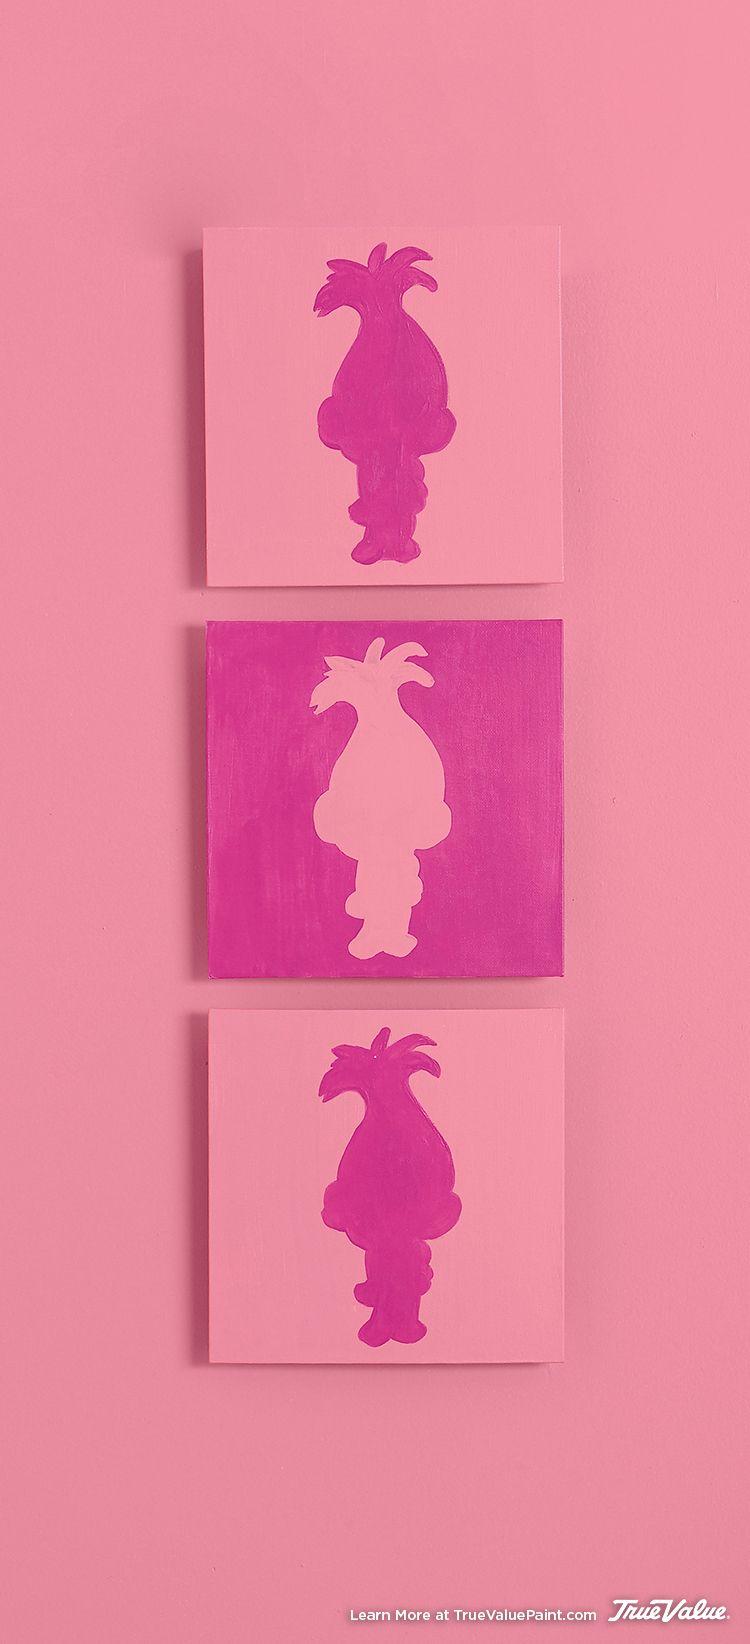 Girls Trolls Bedroom: Create This DIY Wall Art Using DreamWorks Trolls Character